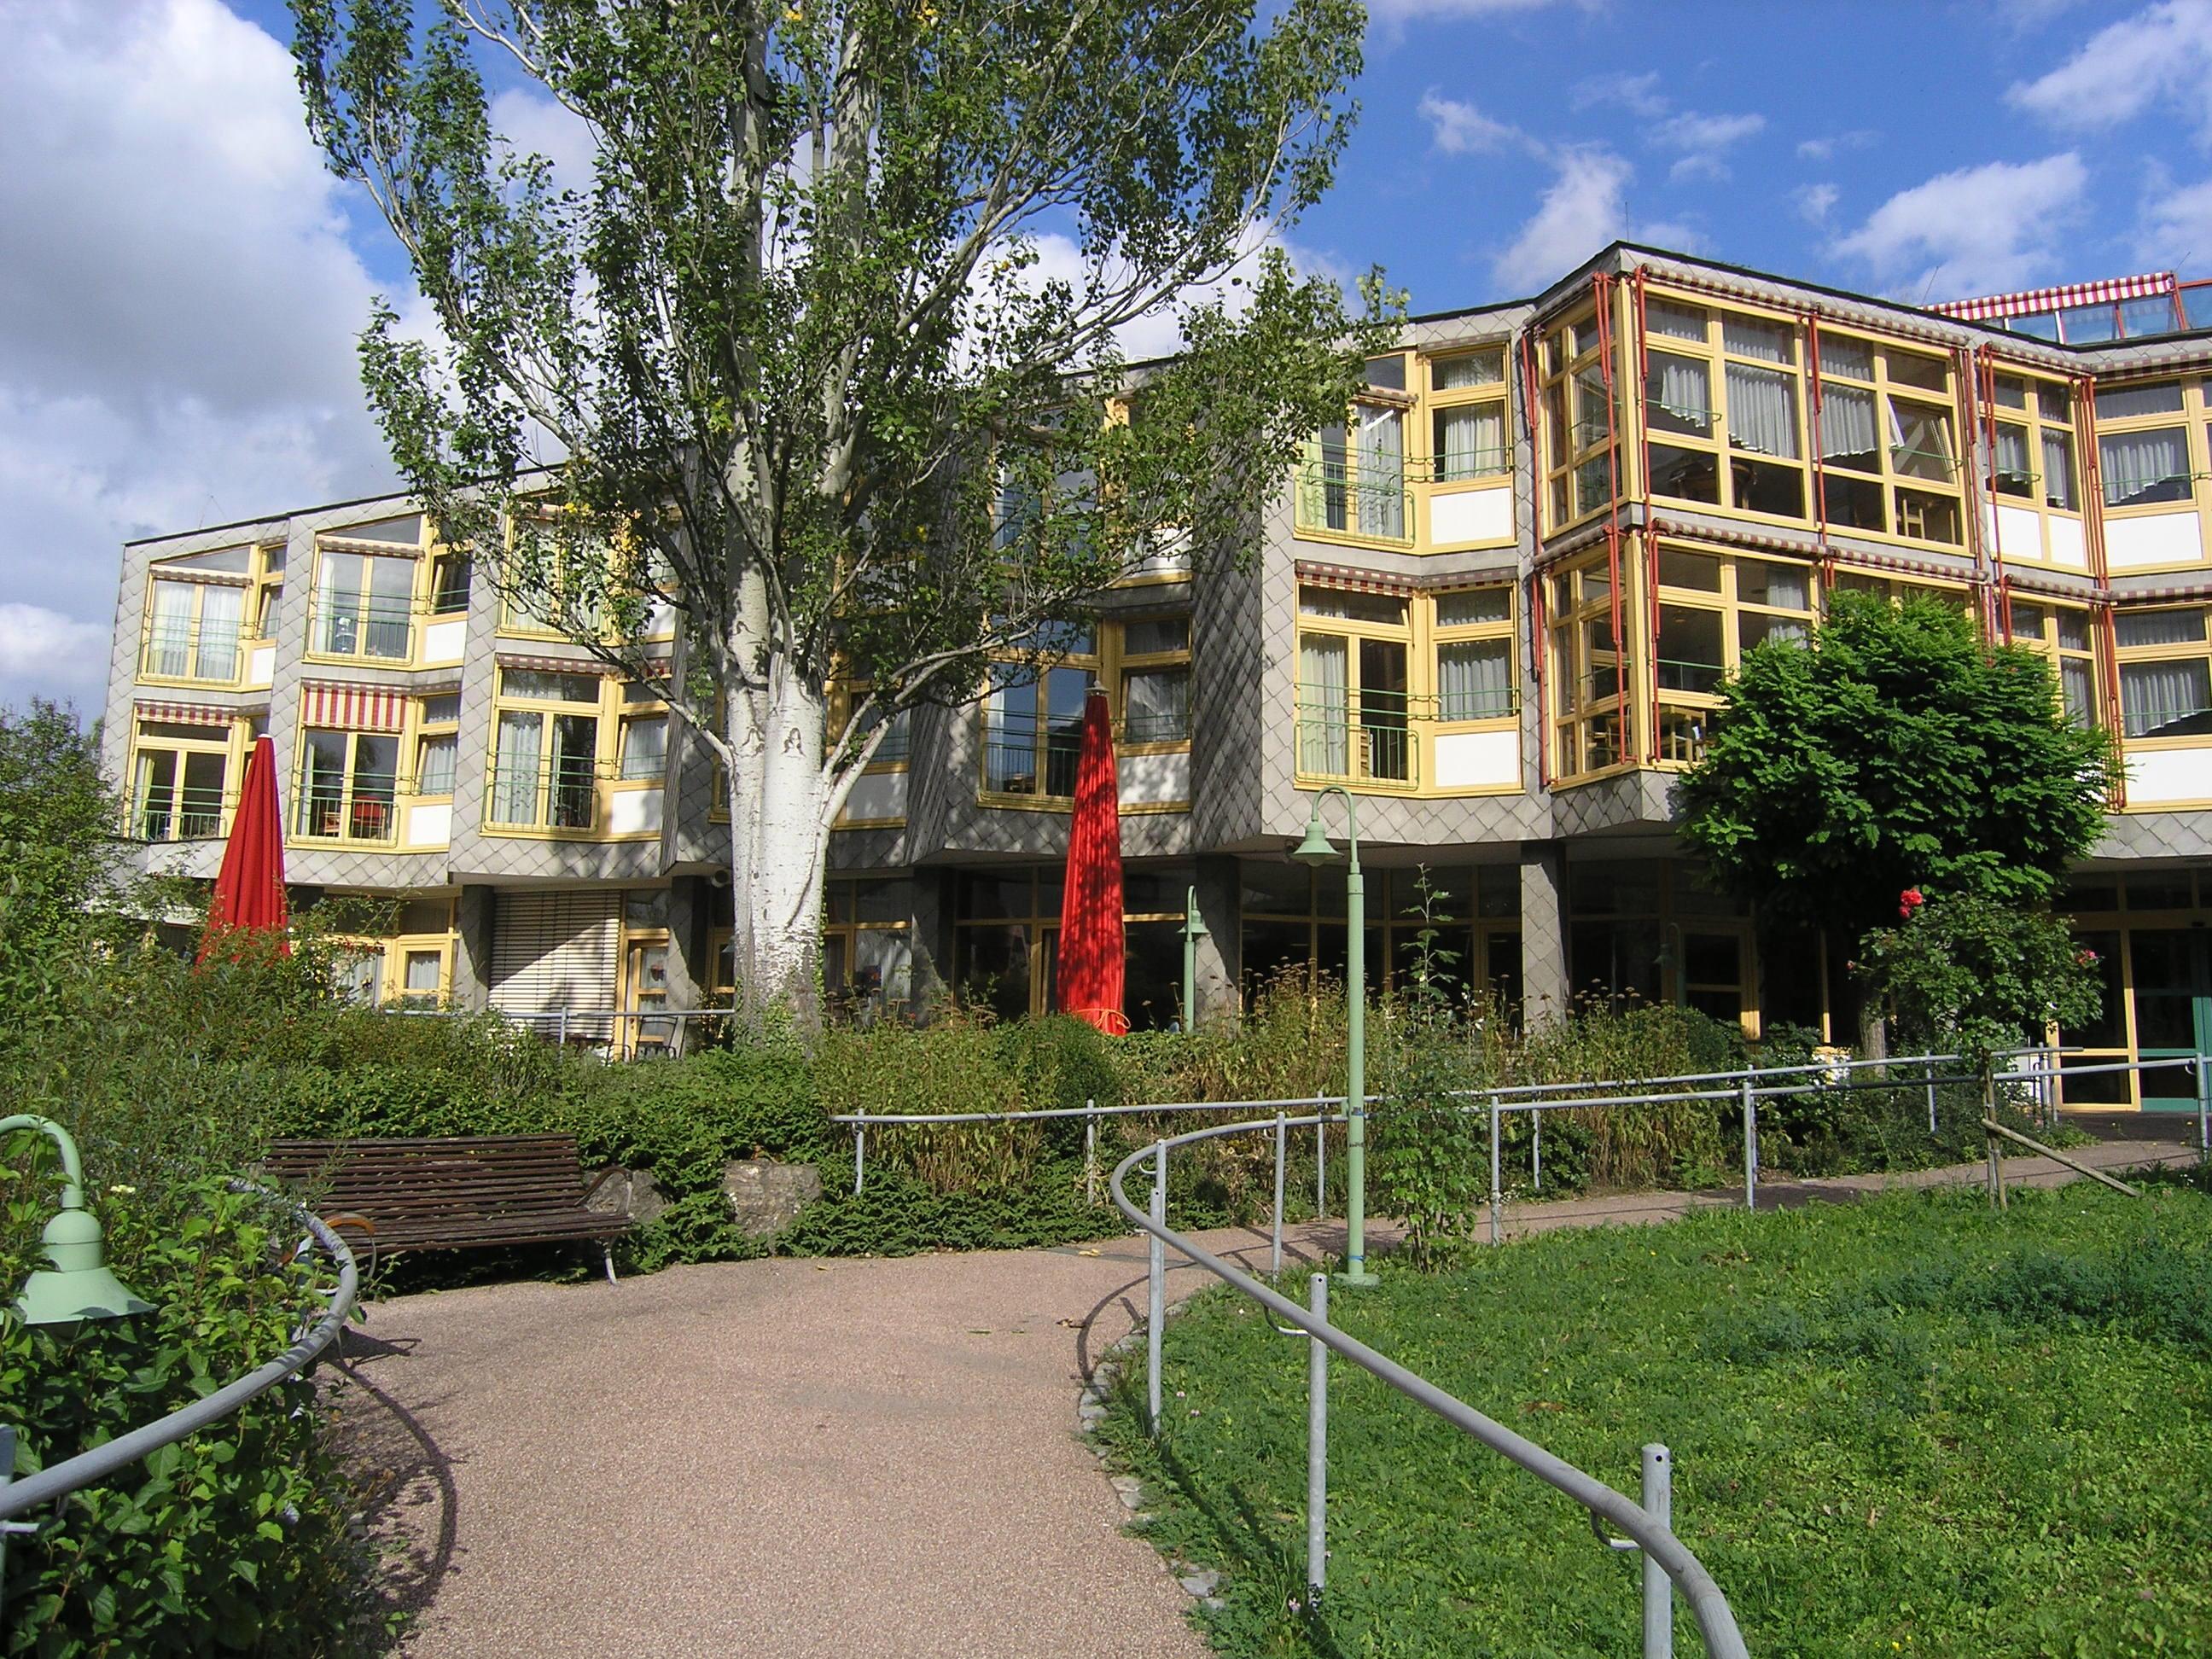 Else-Heydlauf-Stiftung